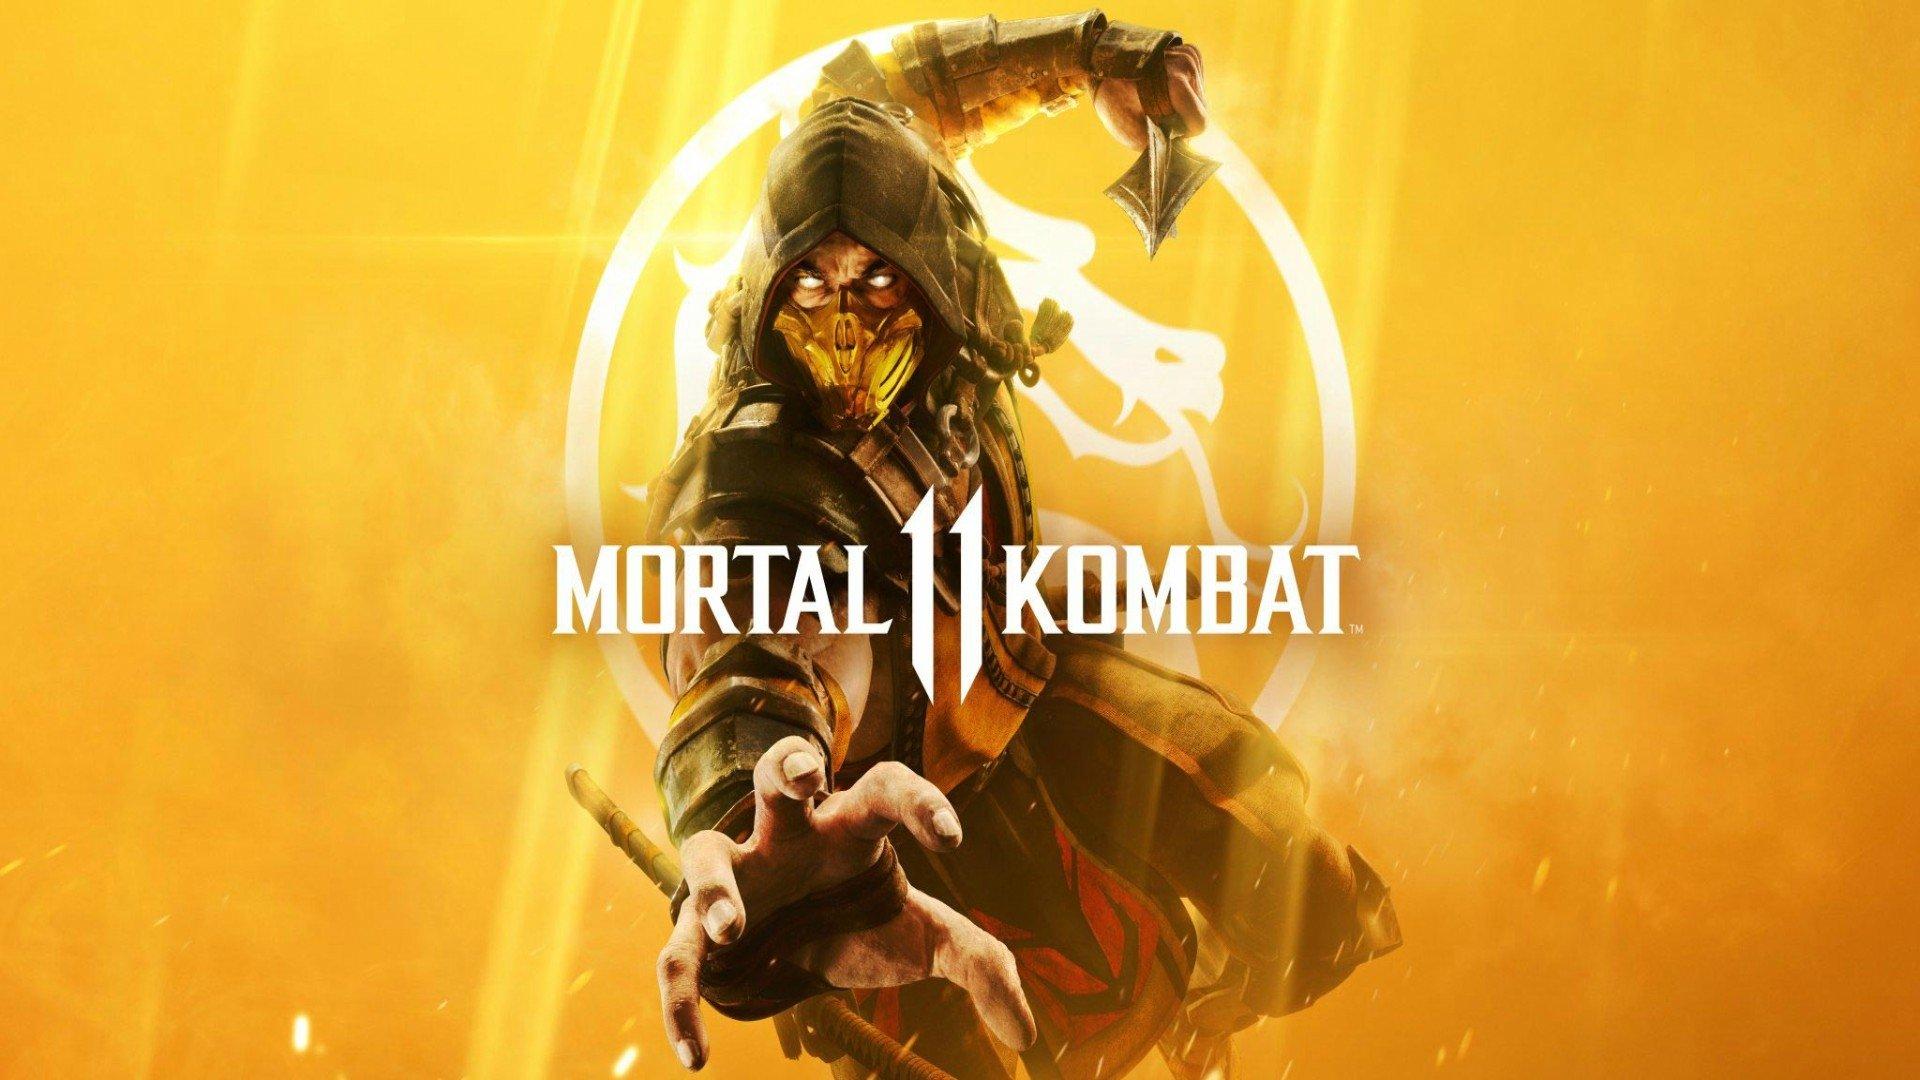 34 Mortal Kombat 11 HD Wallpapers Background Images   Wallpaper 1920x1080